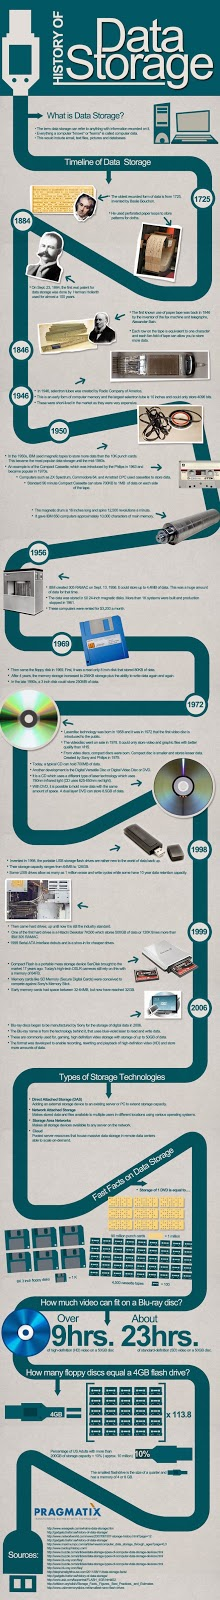 History of fata storage